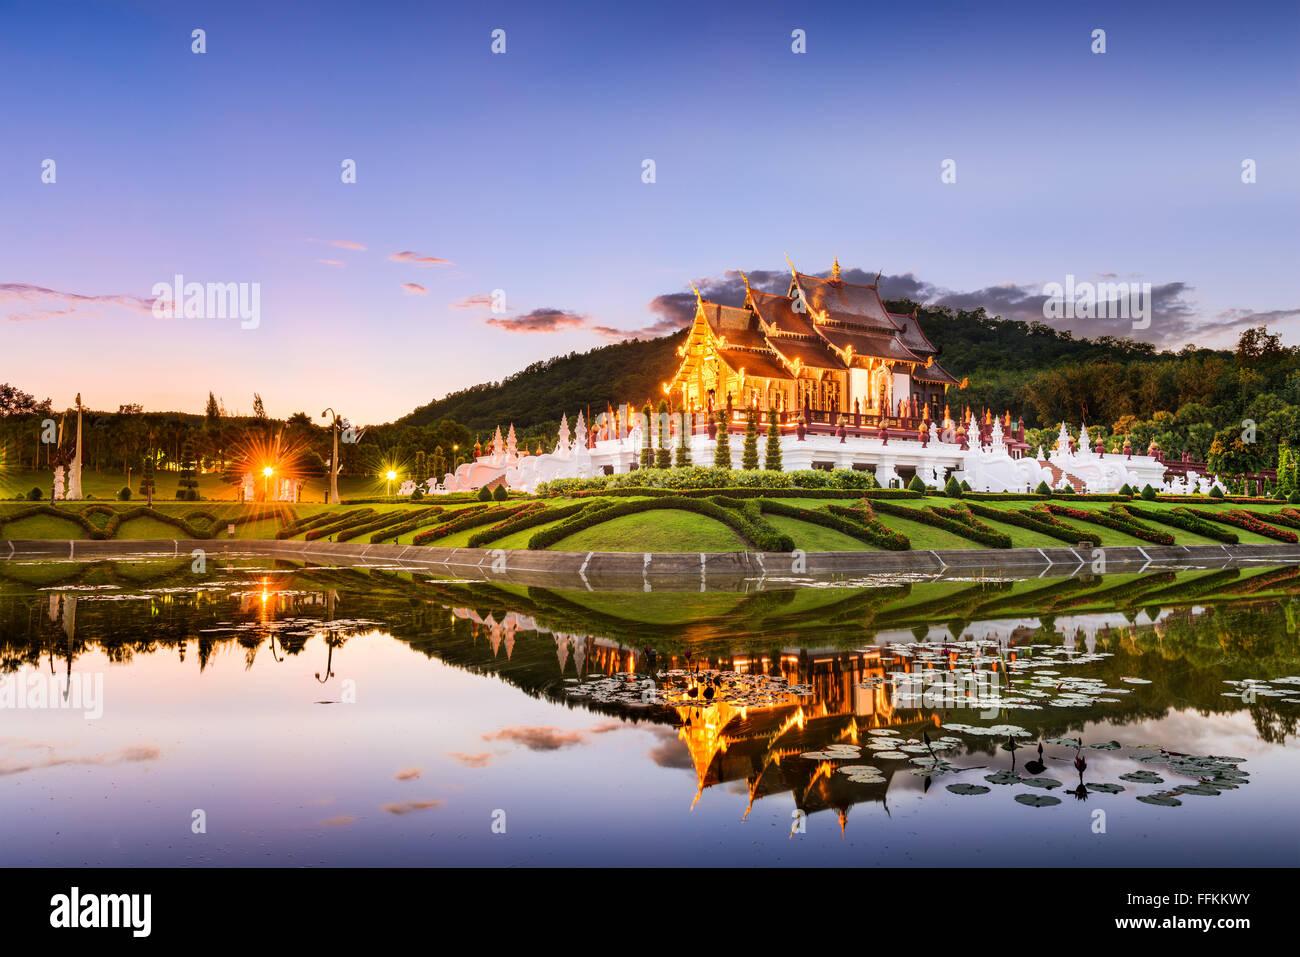 Chiang Mai, Tailandia, en Royal Flora Ratchaphruek Park. Imagen De Stock